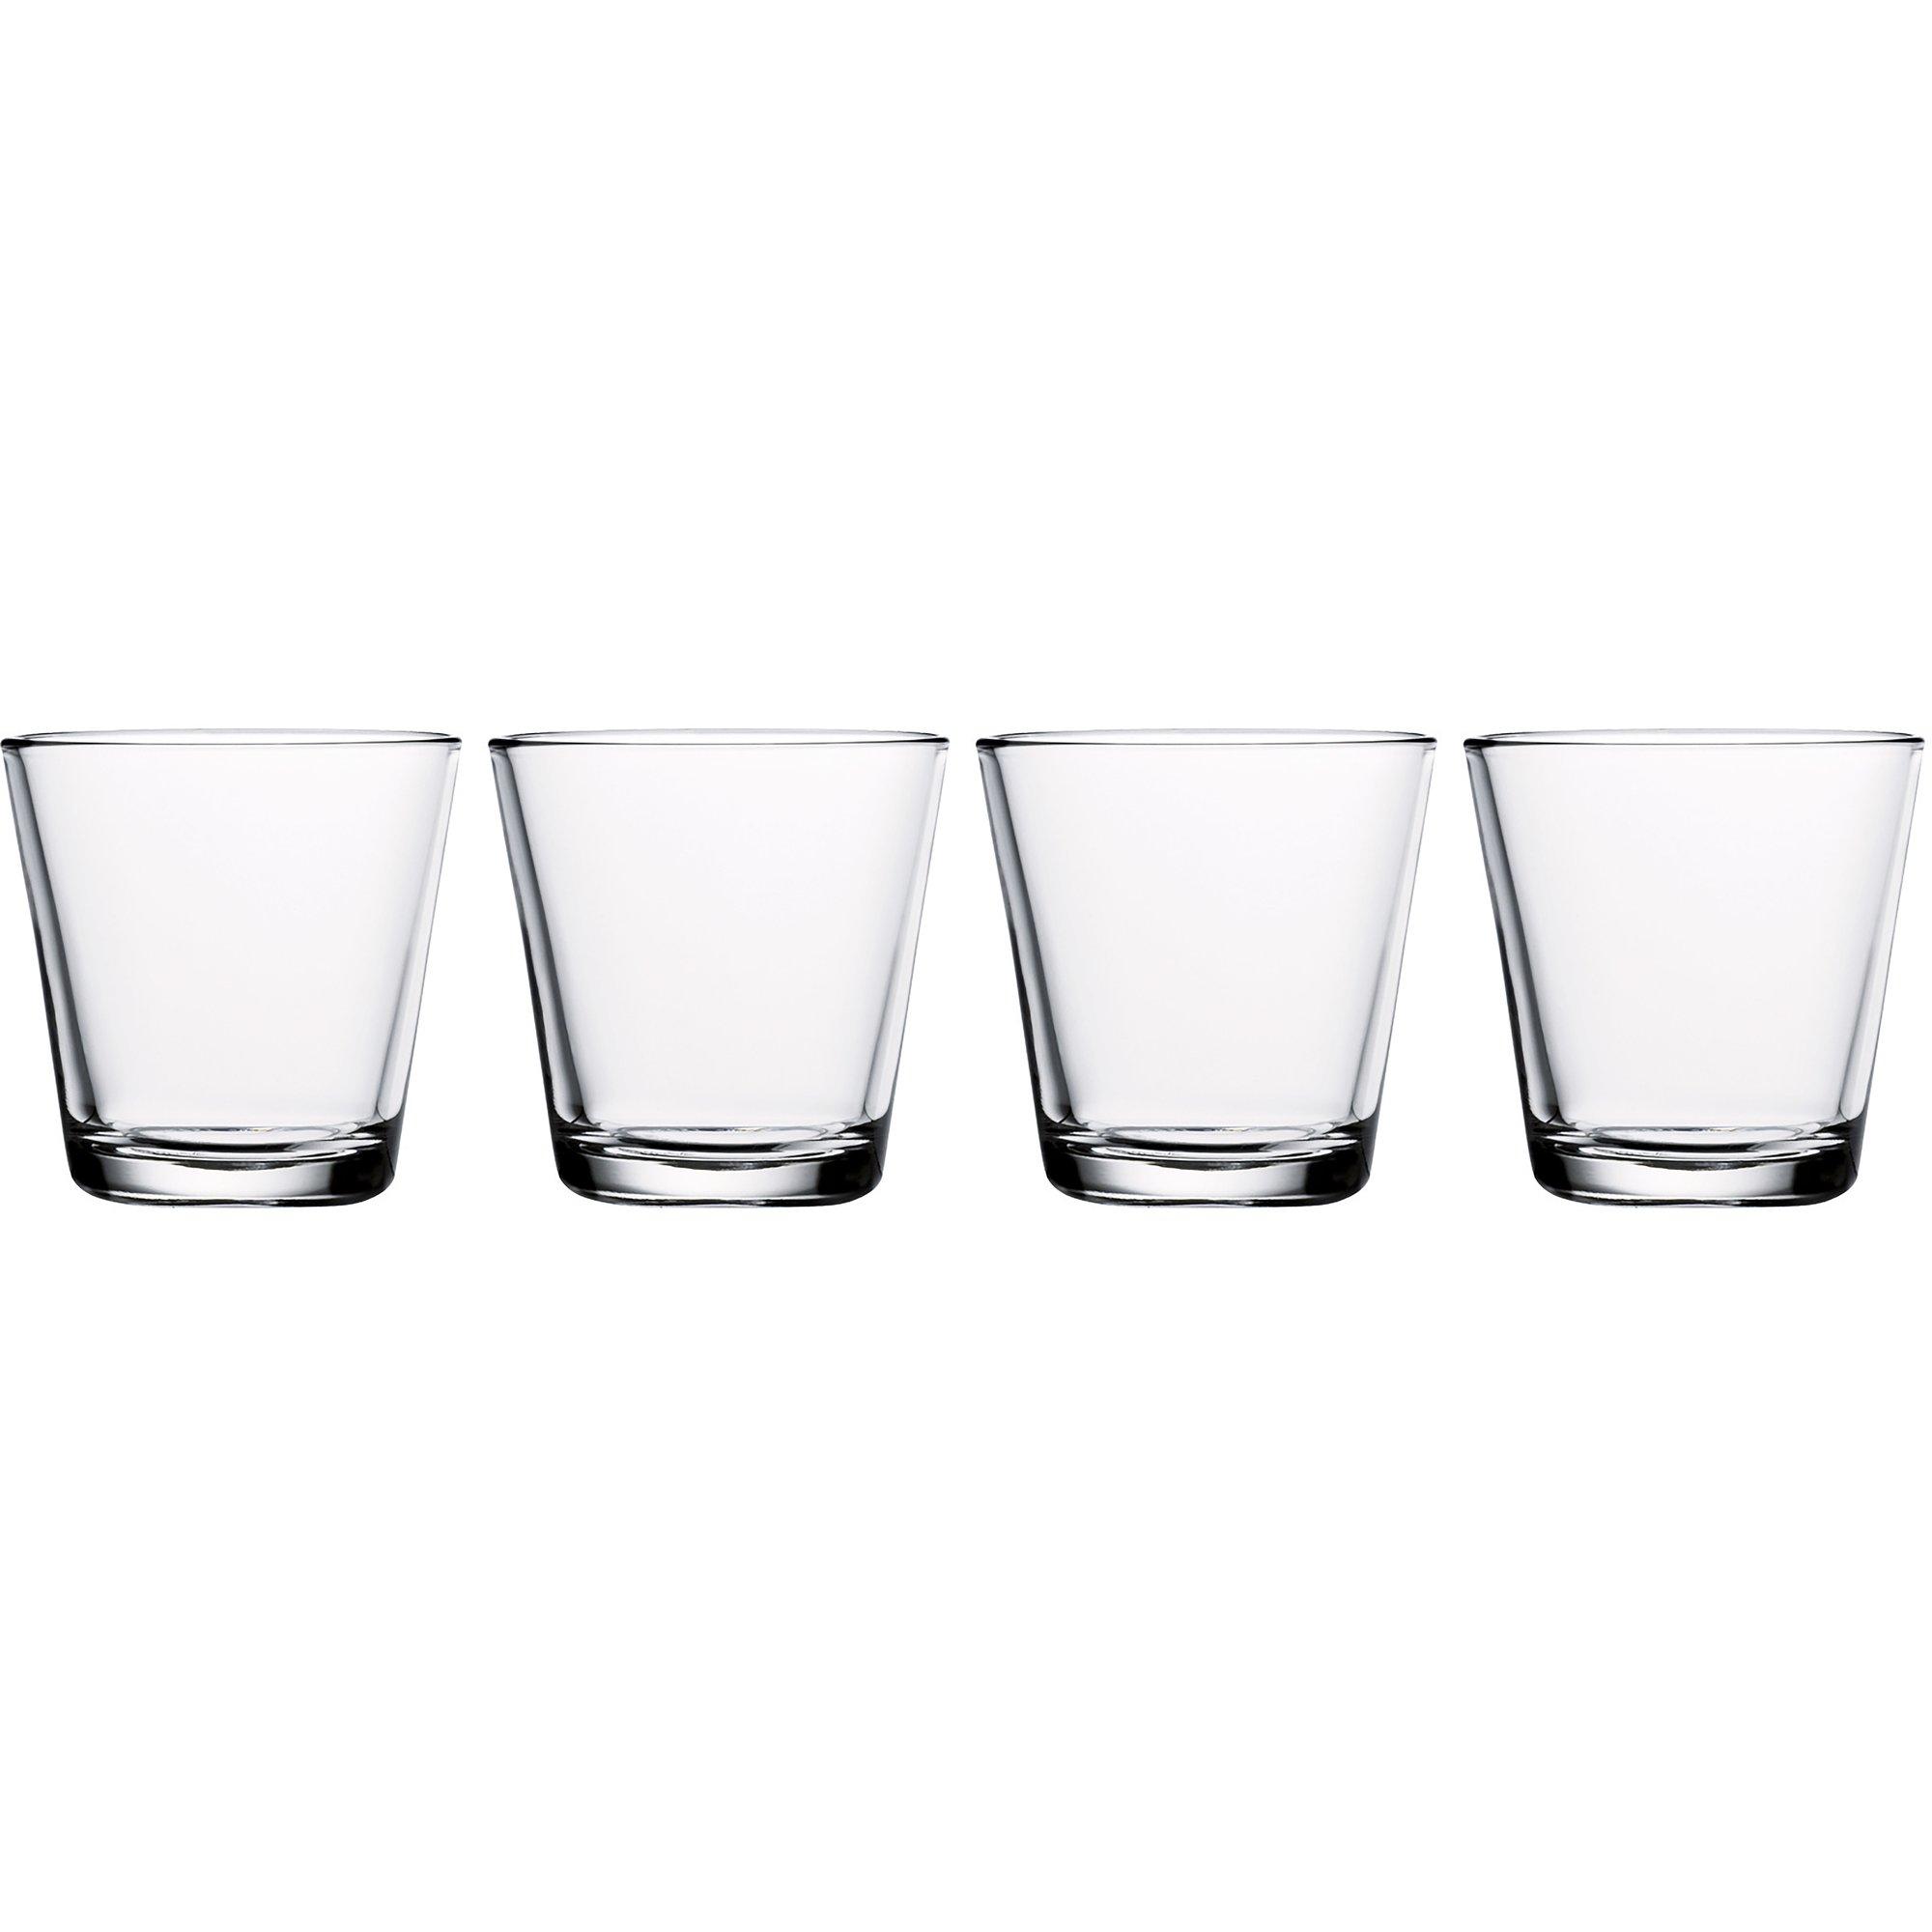 Iittala Kartio dricksglas 21 cl. 4 st. klar